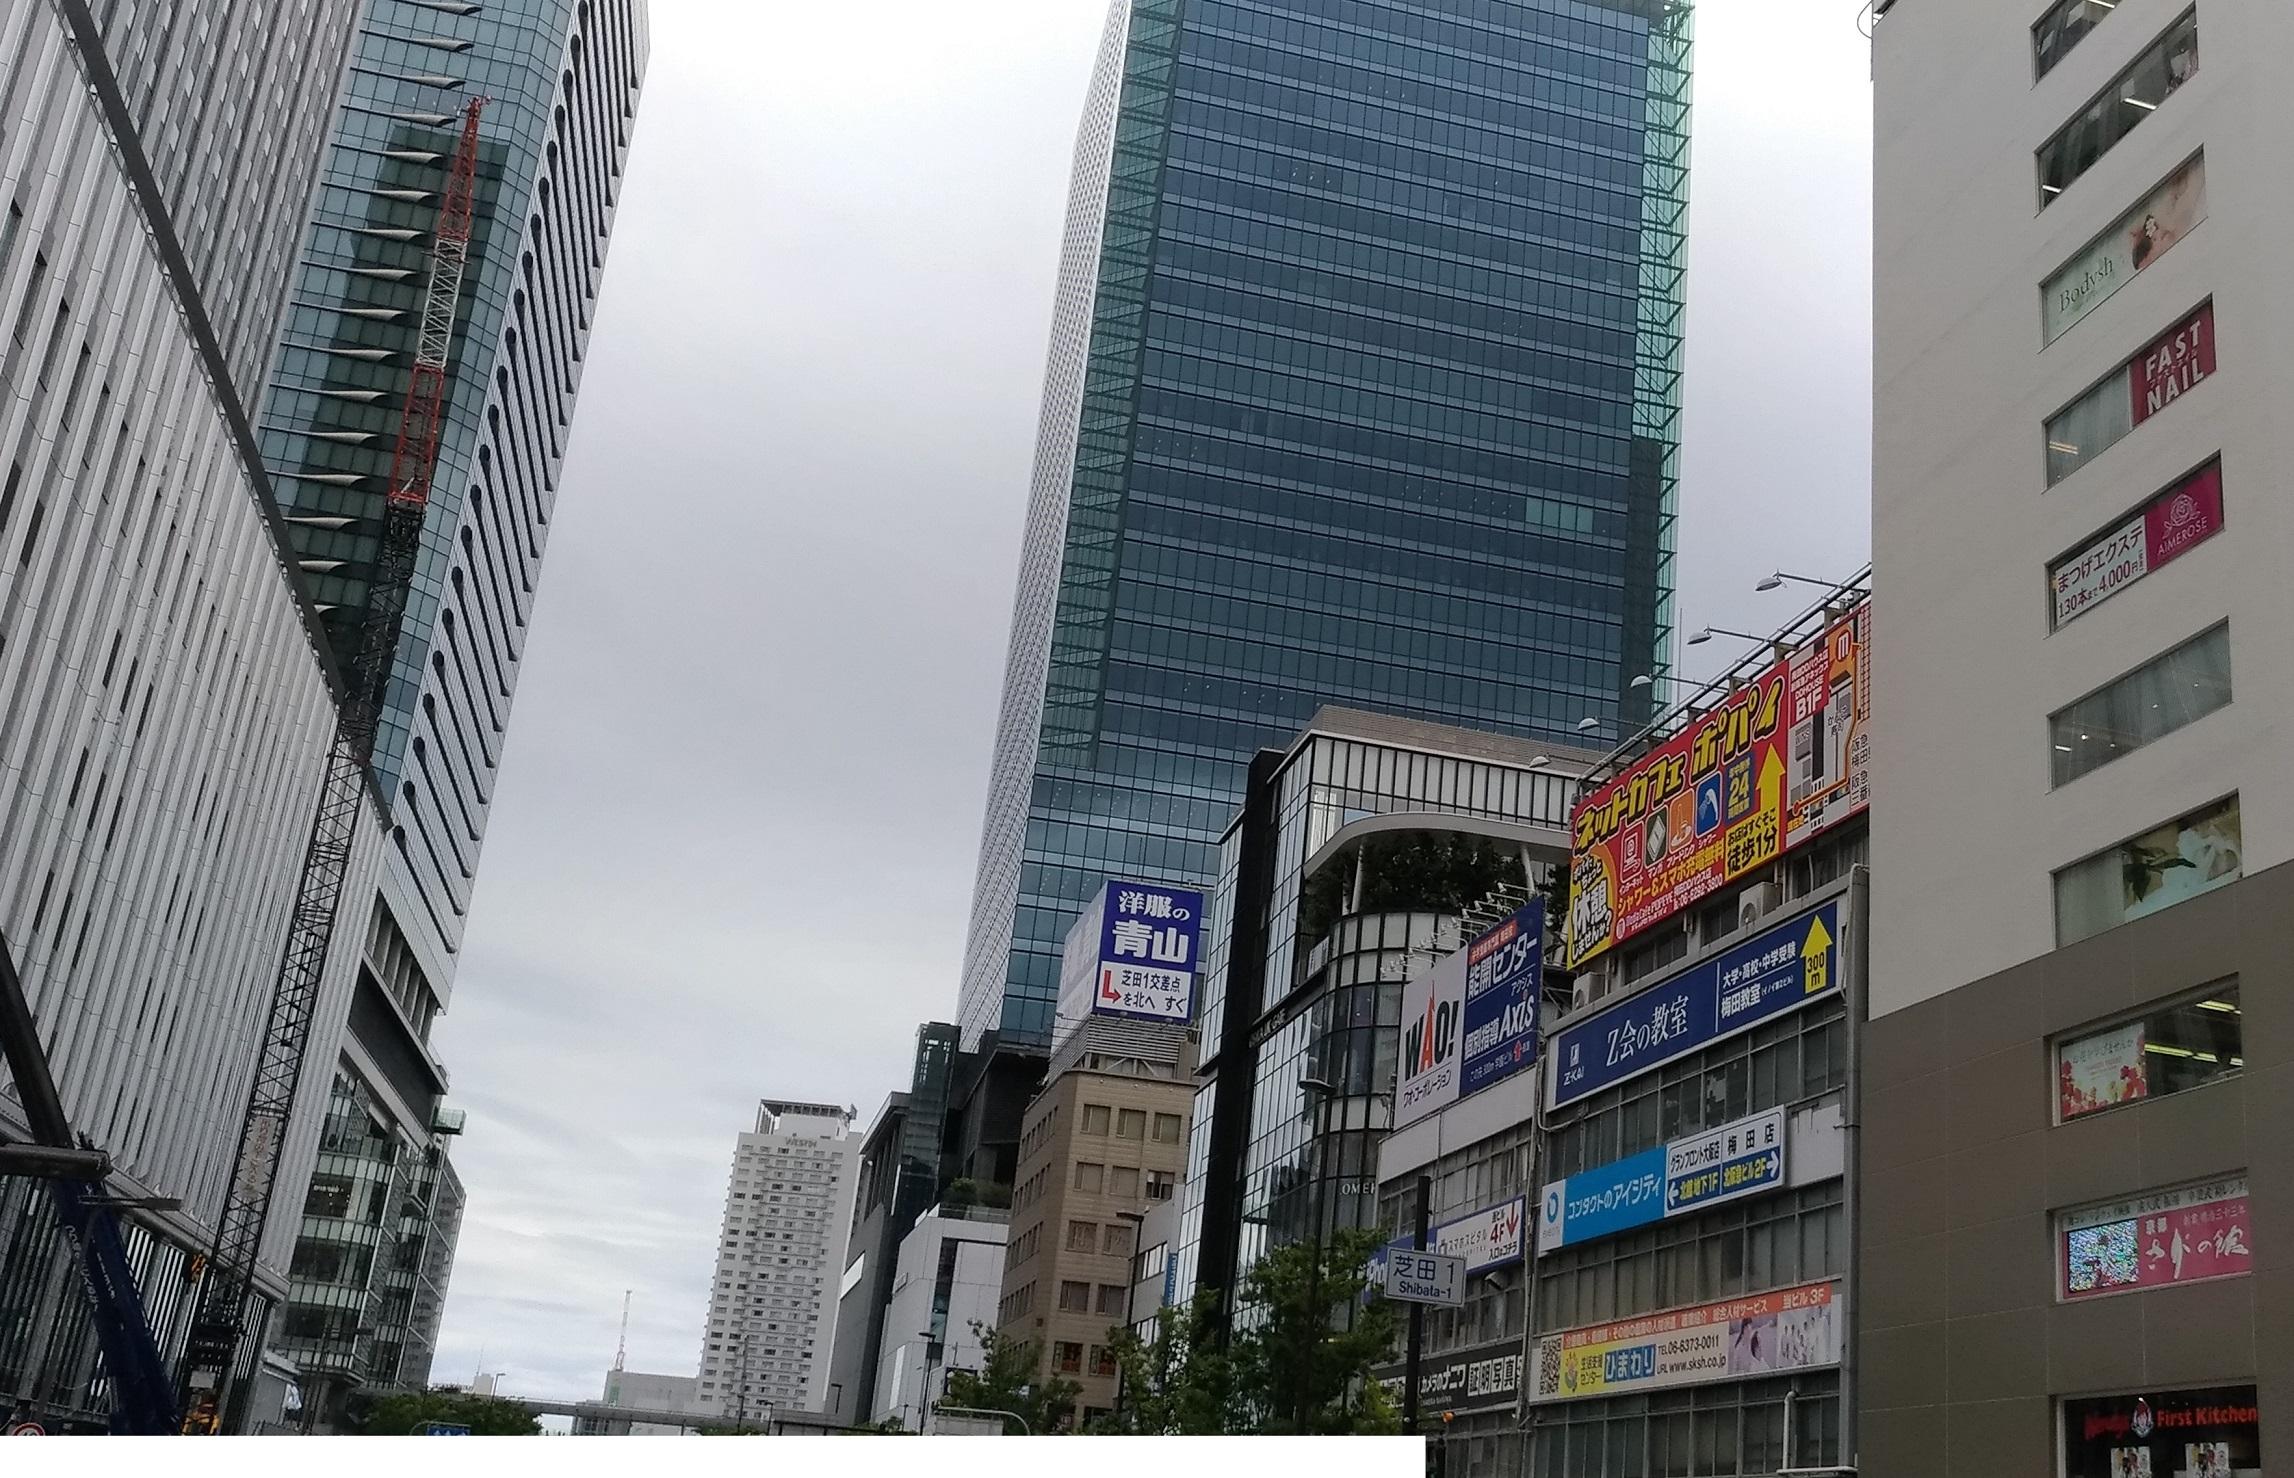 osaka_yodobashi_umeda_0706_.jpg